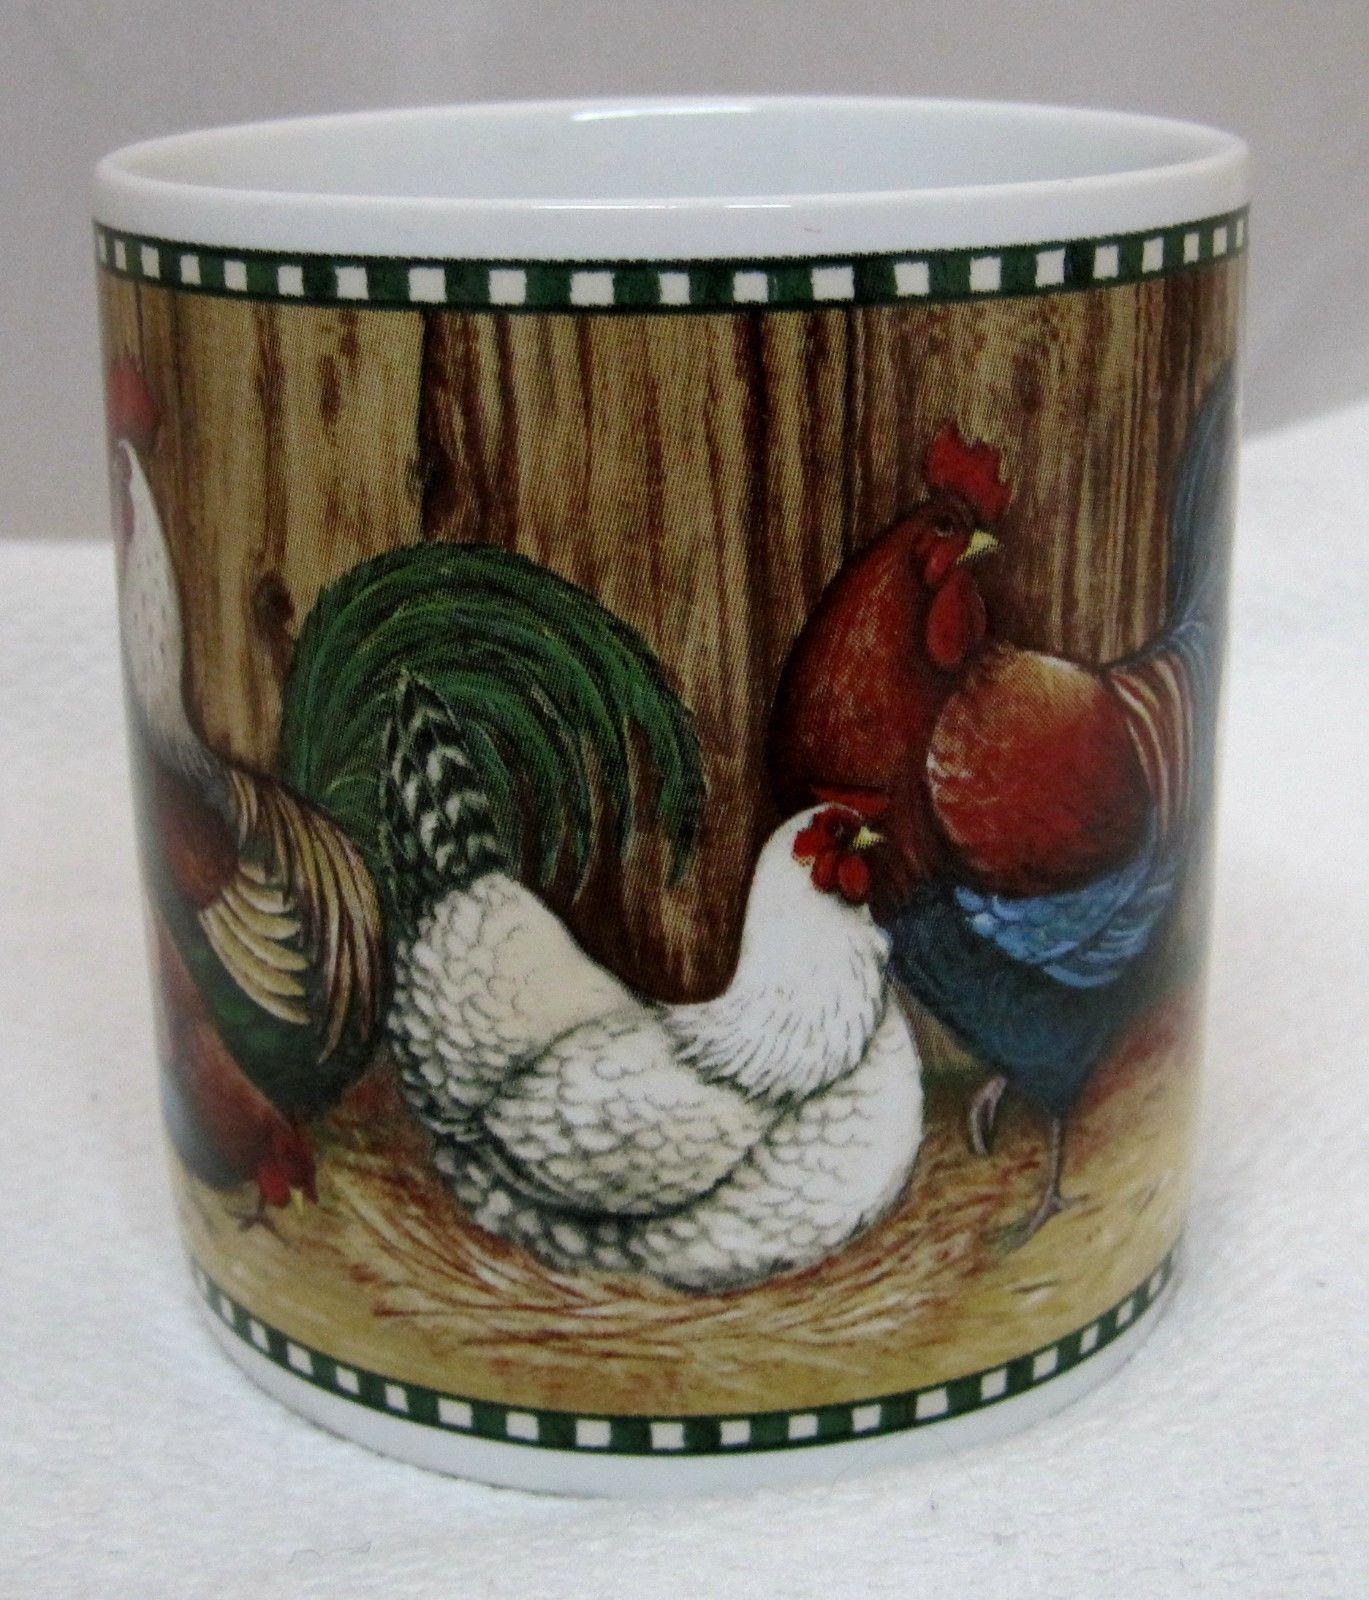 David Carter Brown Coffee Mug On the Farm 2002 Sakura Rooster & Chicken